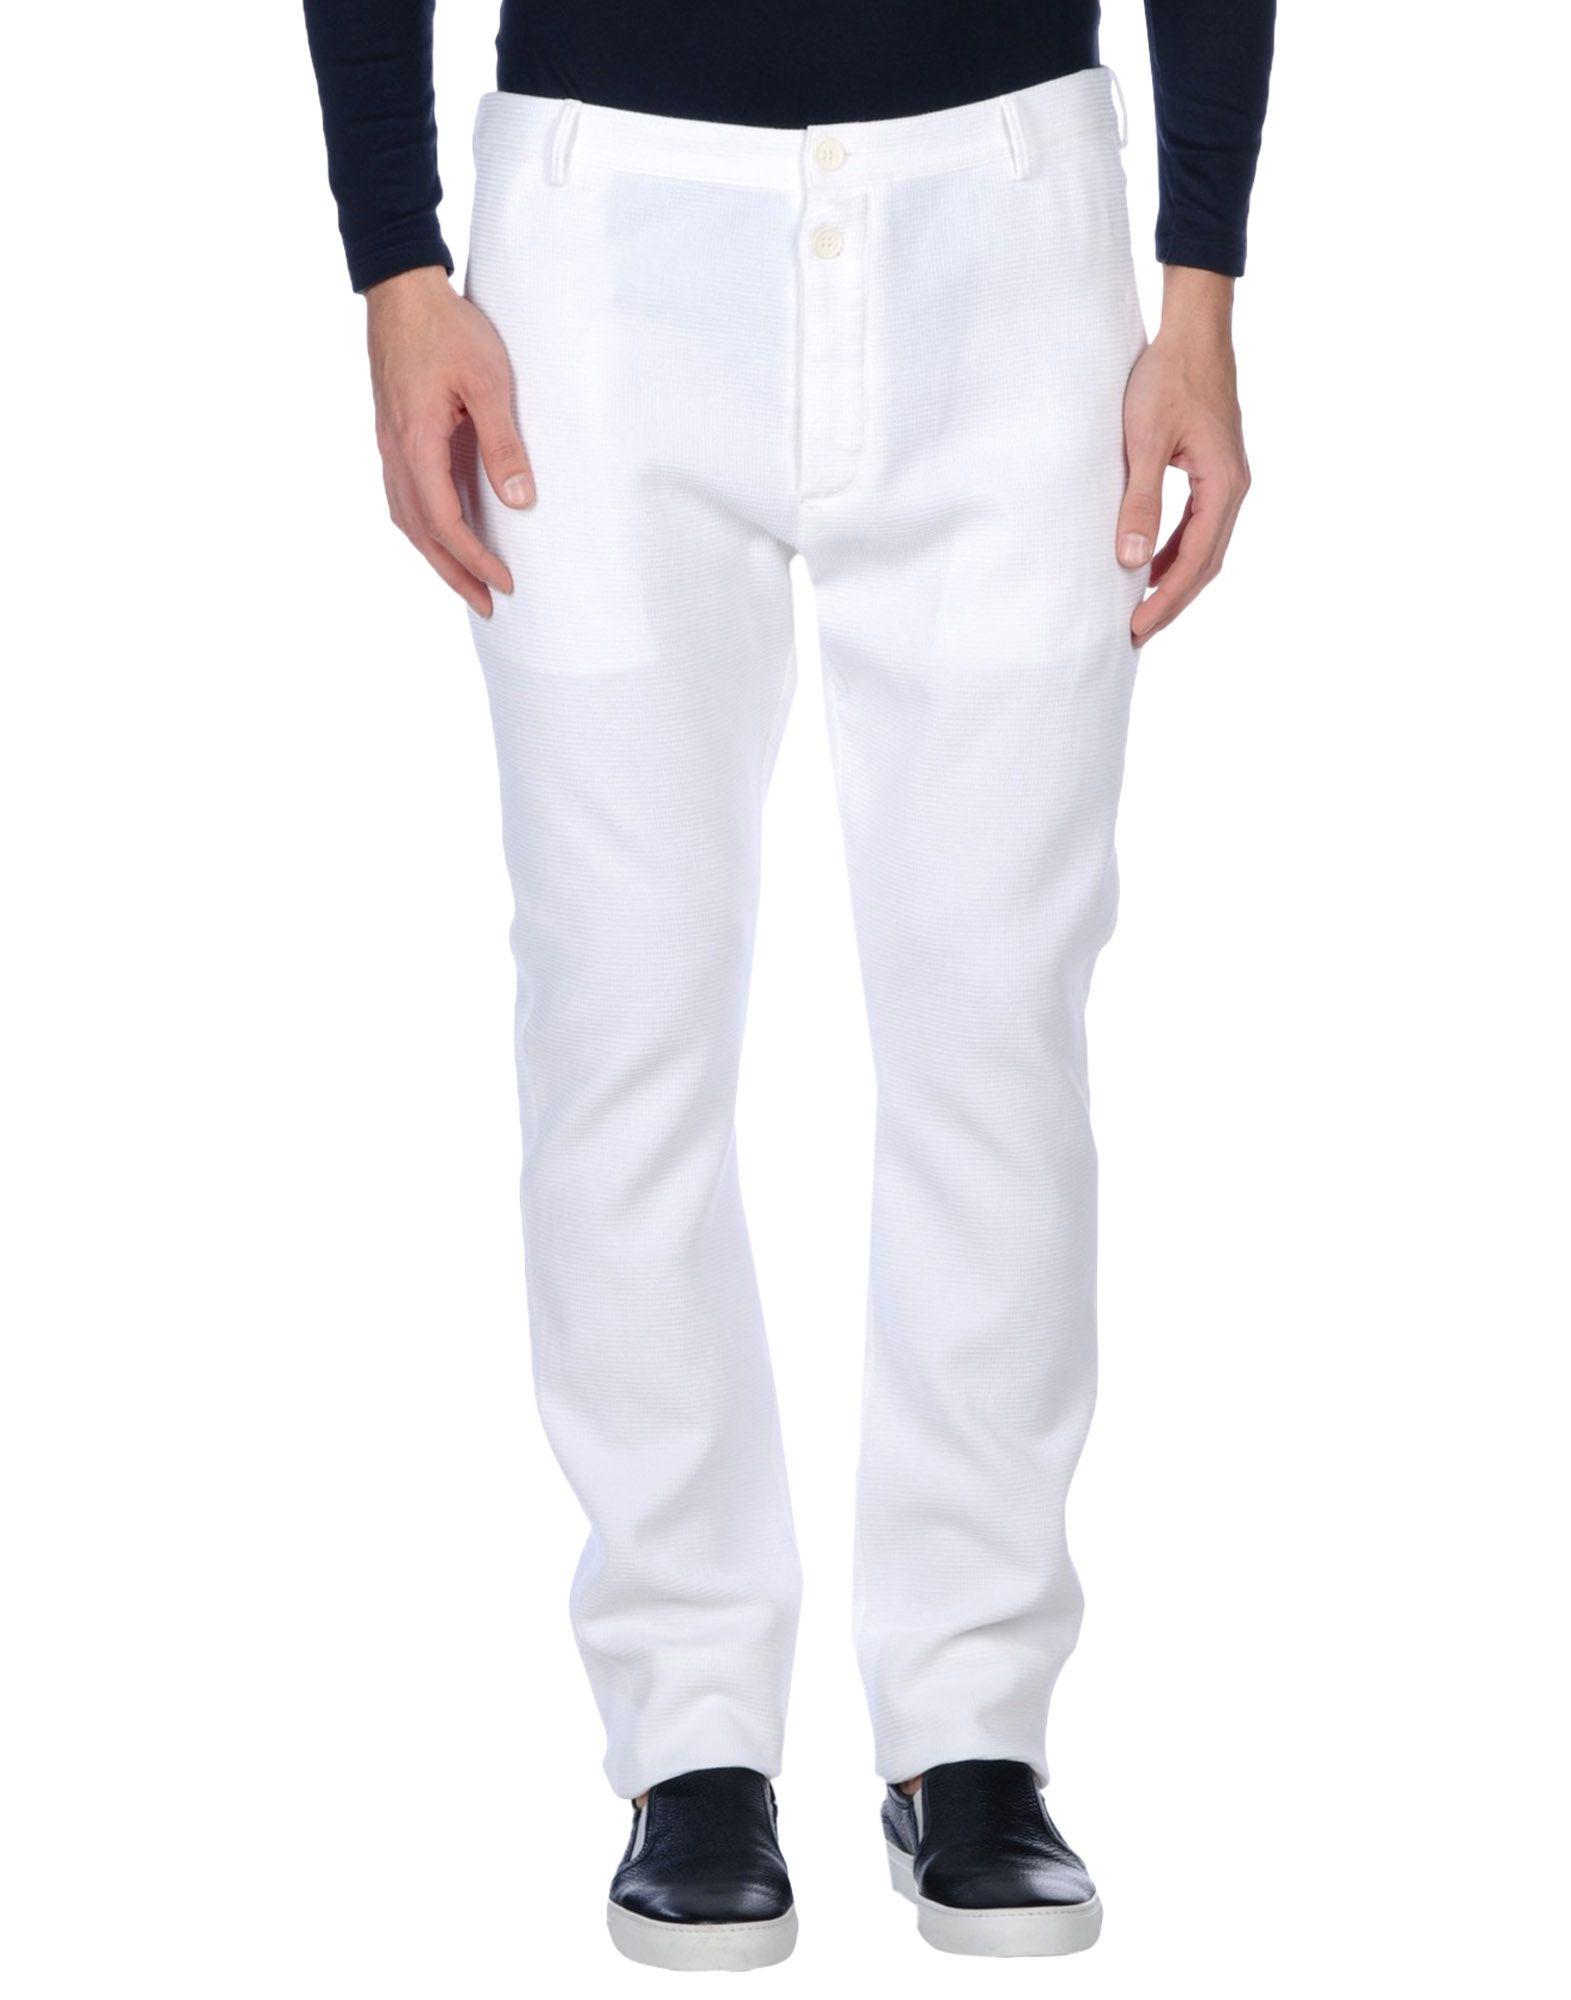 DIRK BIKKEMBERGS Повседневные брюки цены онлайн